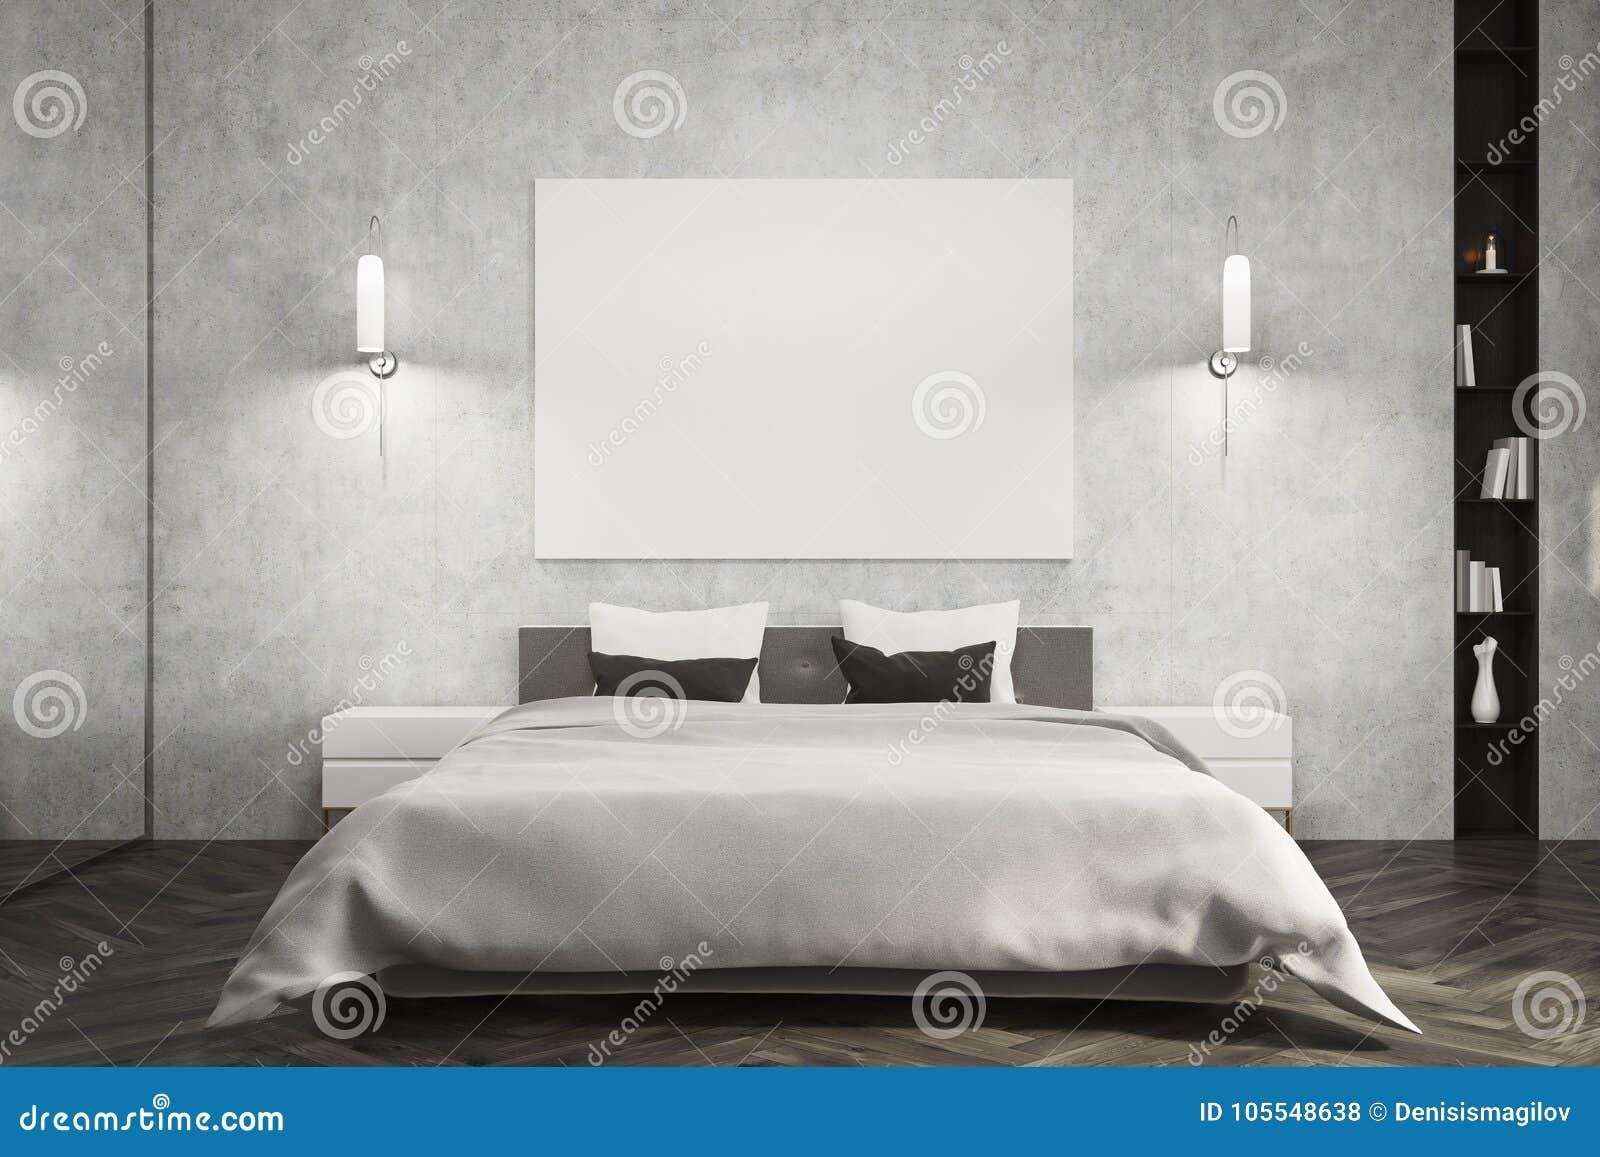 Gray Bedroom White Bed Poster Stock Illustration Illustration Of Paper Empty 105548638